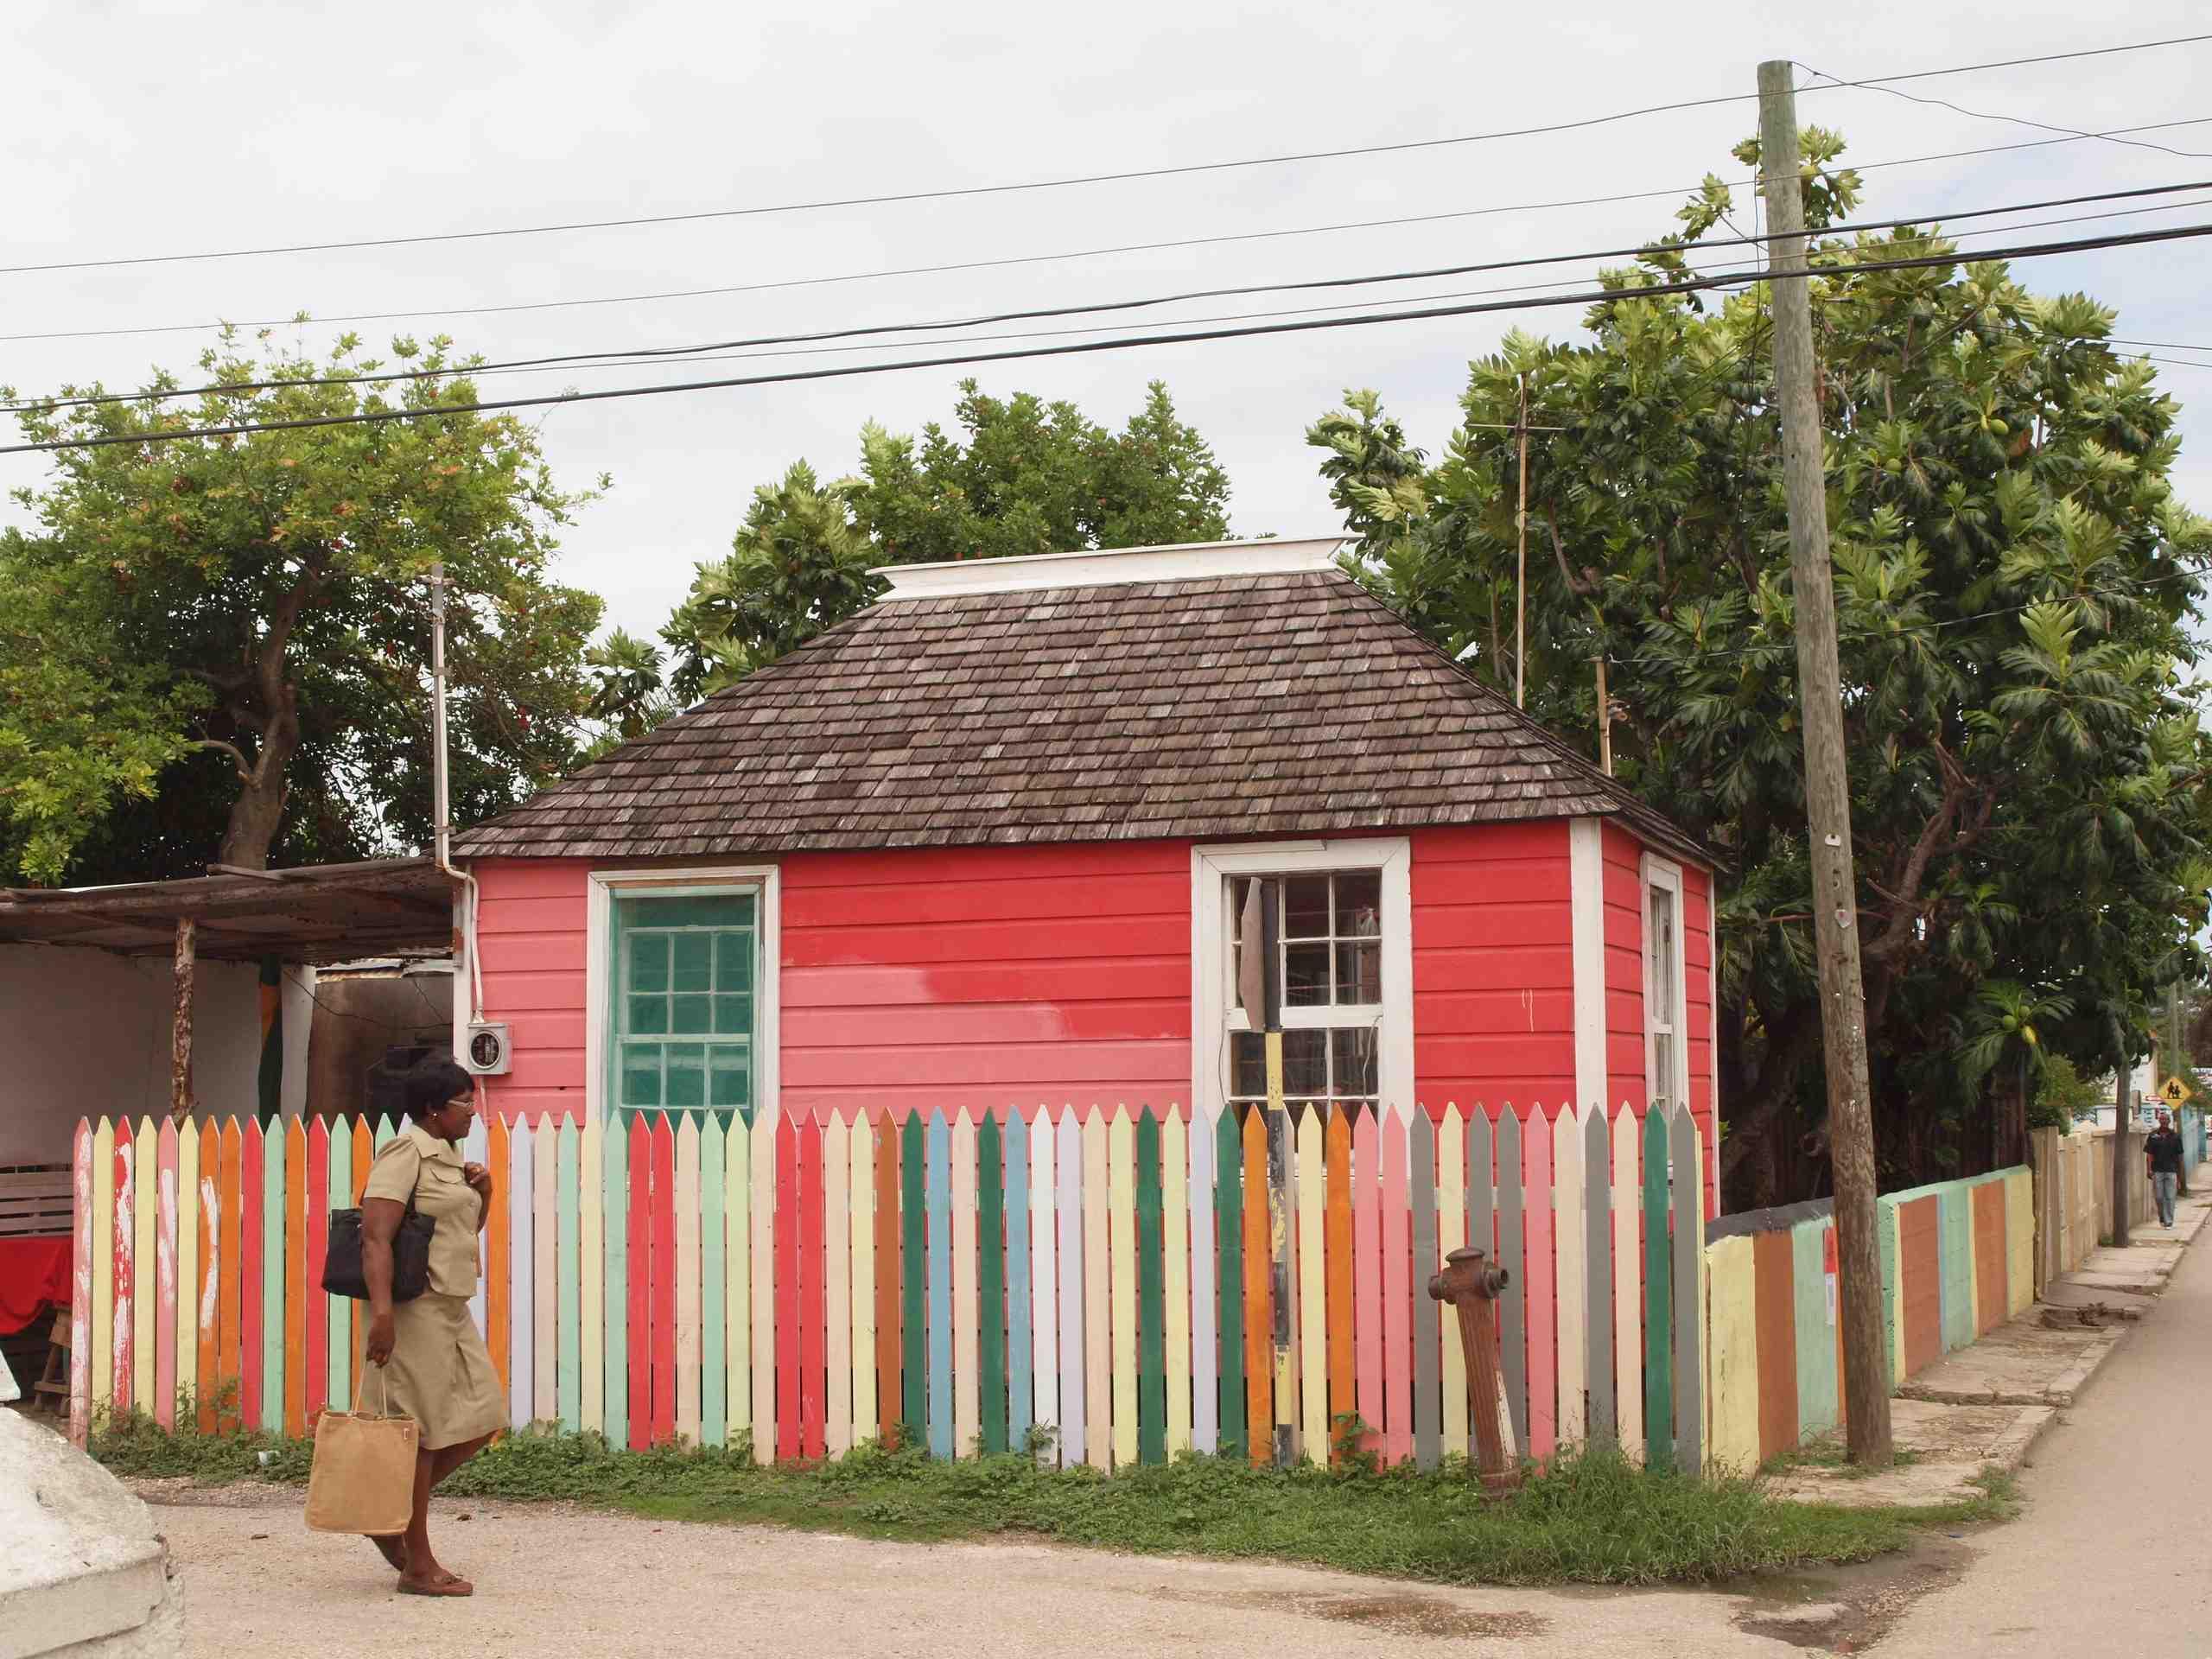 Jamaican Home Designs On Jamaican Home Designs Jamaica Home Designs